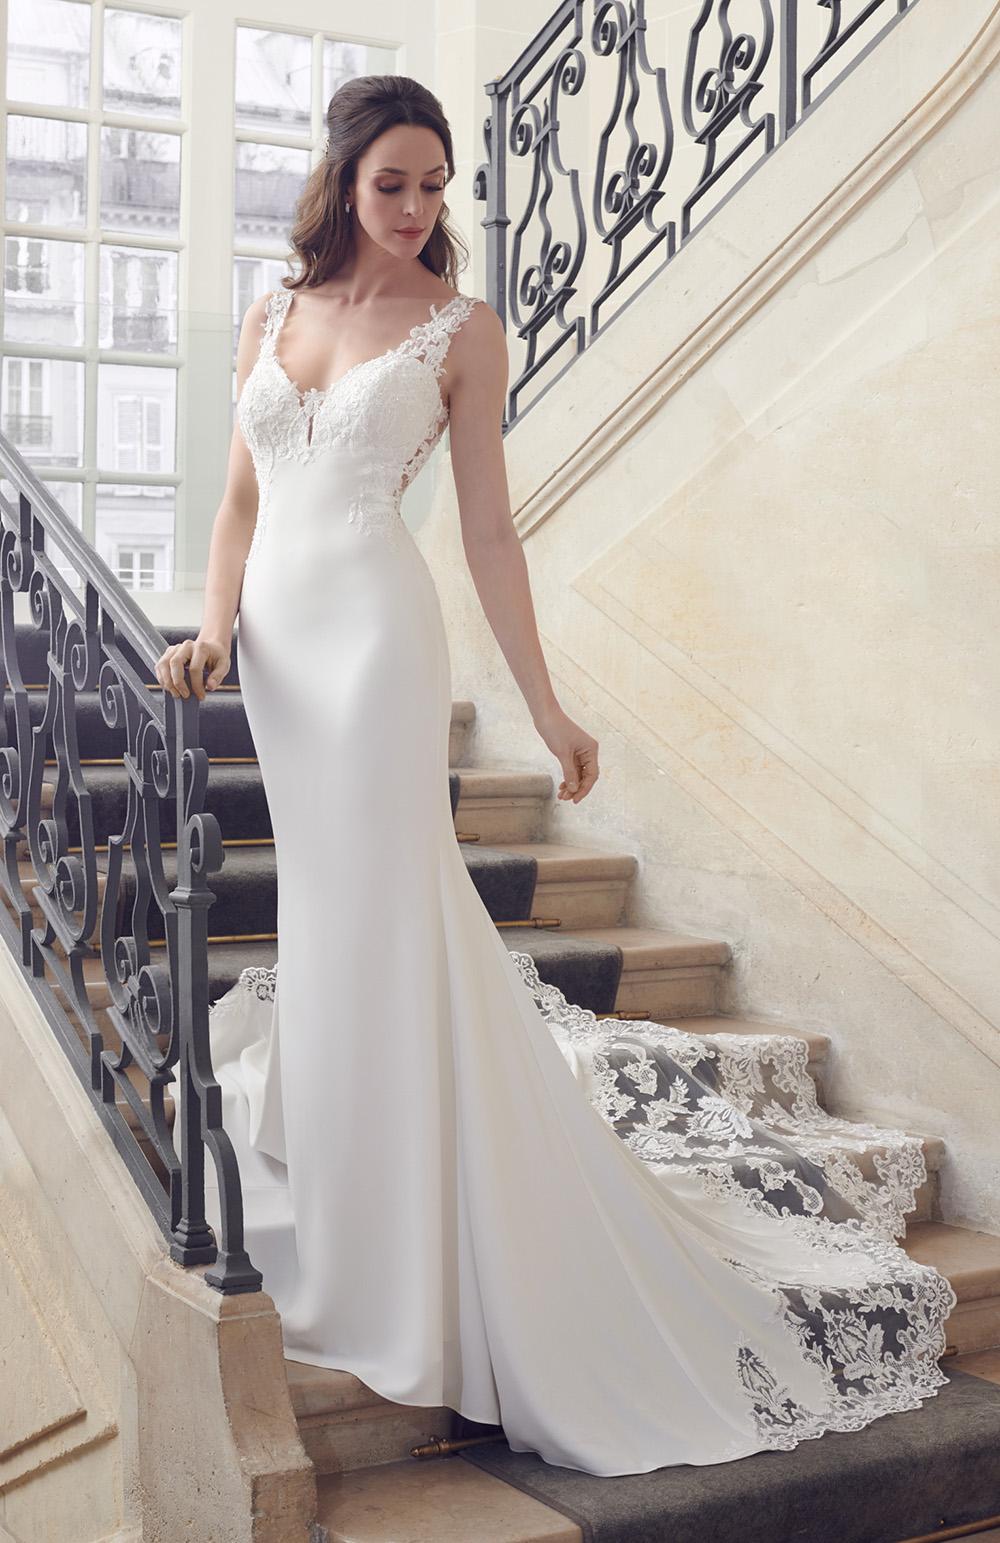 Robe de mariée Modèle Omaya